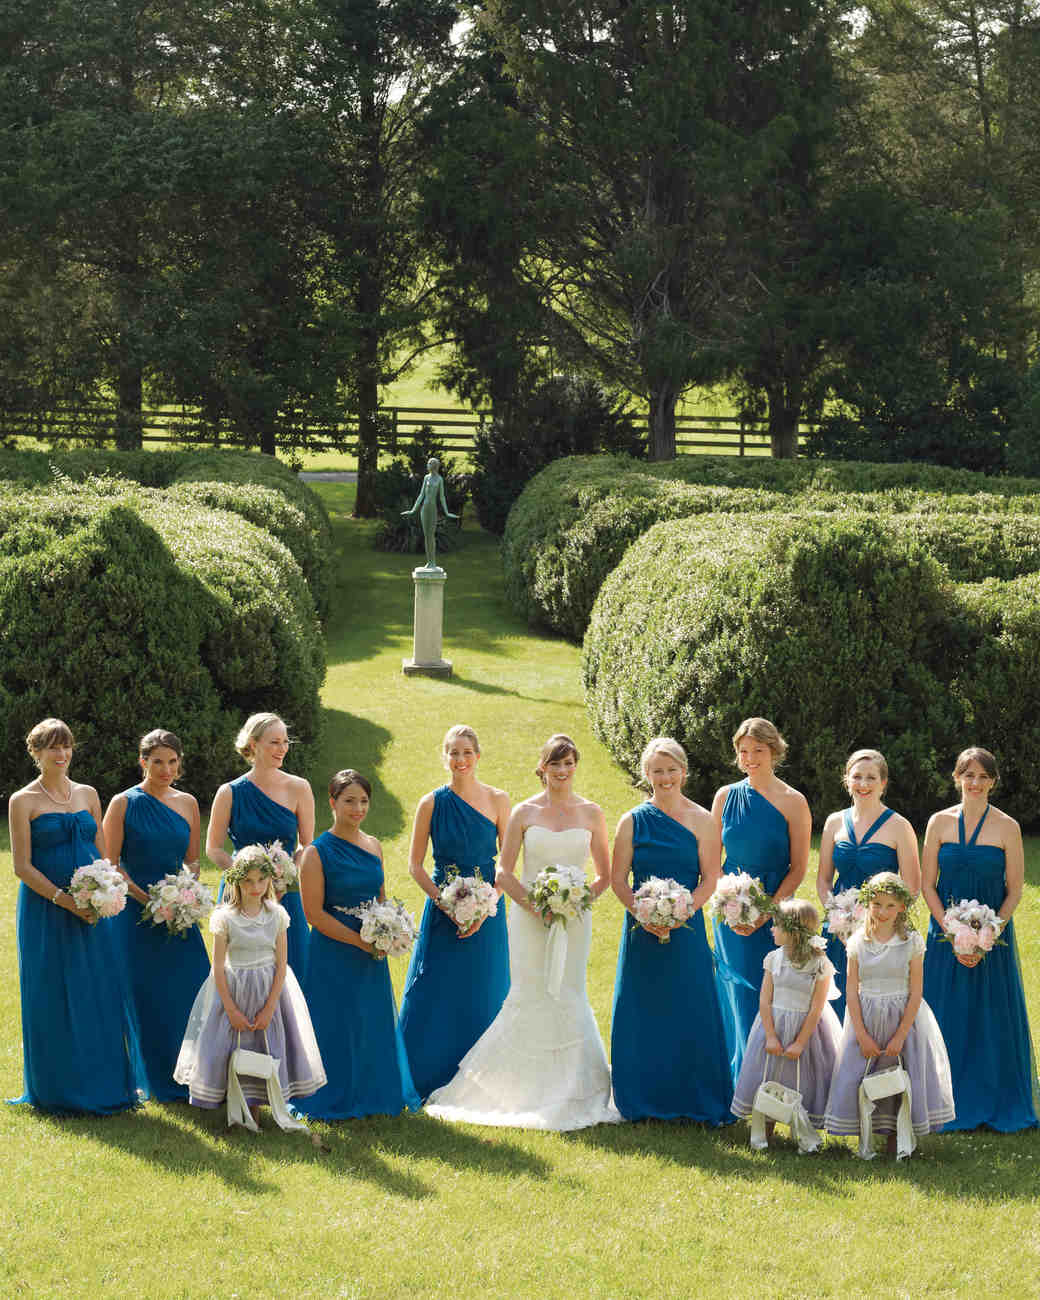 kennedy-gregory-bride-038-mwd108943.jpg